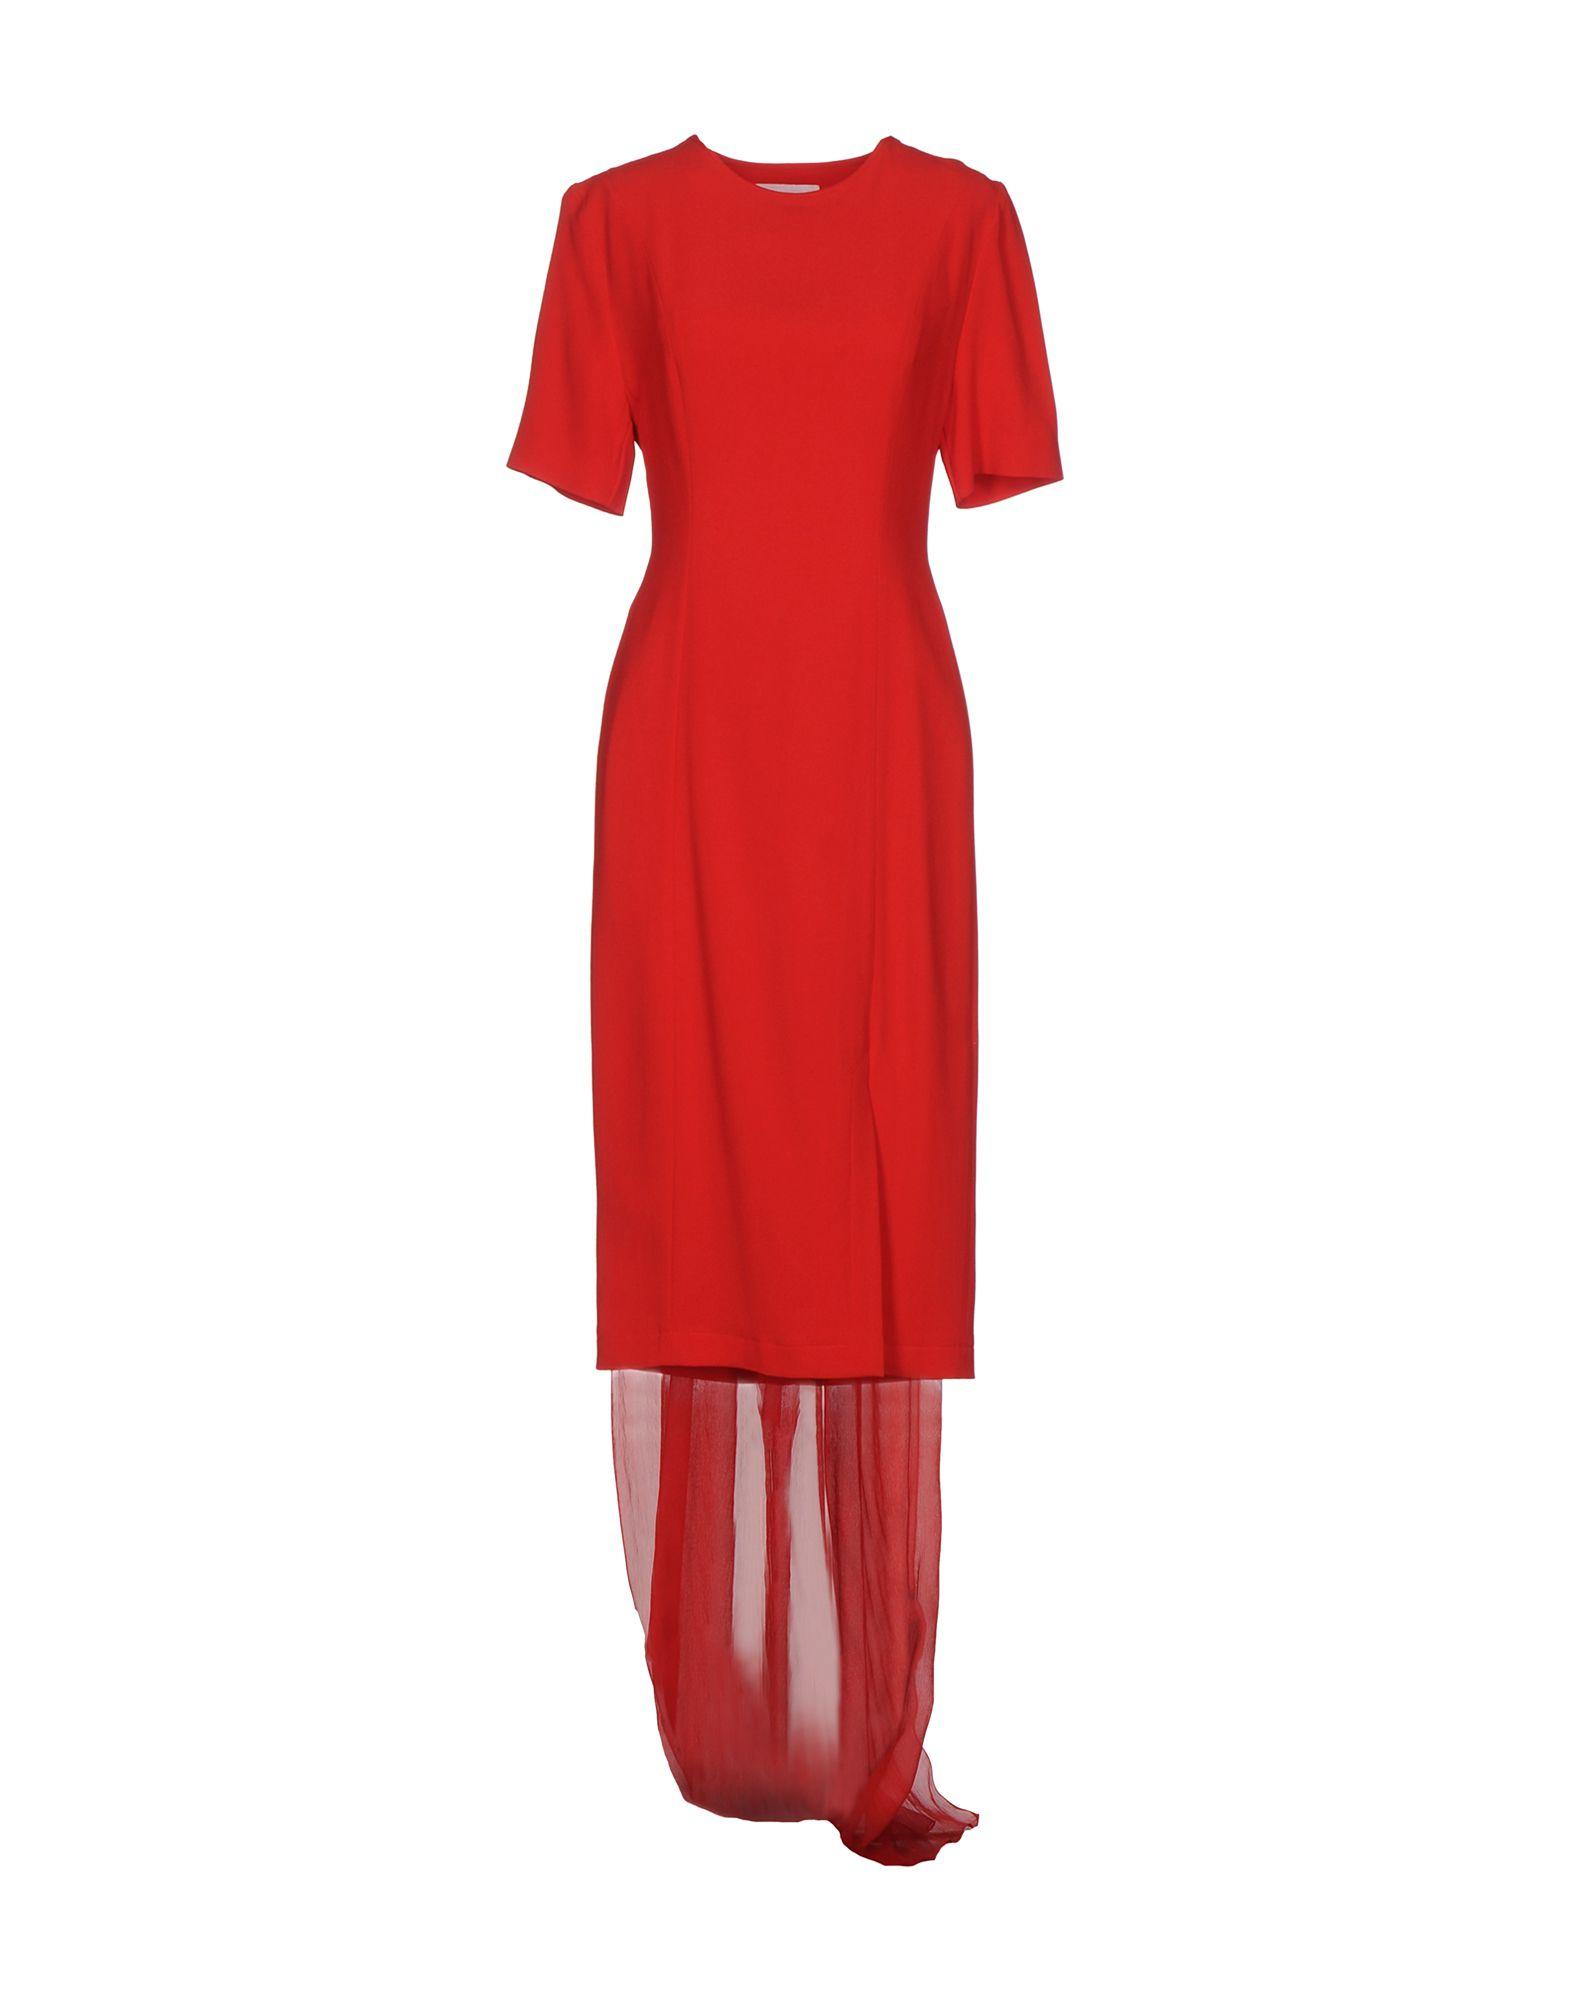 DANIELE CARLOTTA Knee-Length Dress in Red